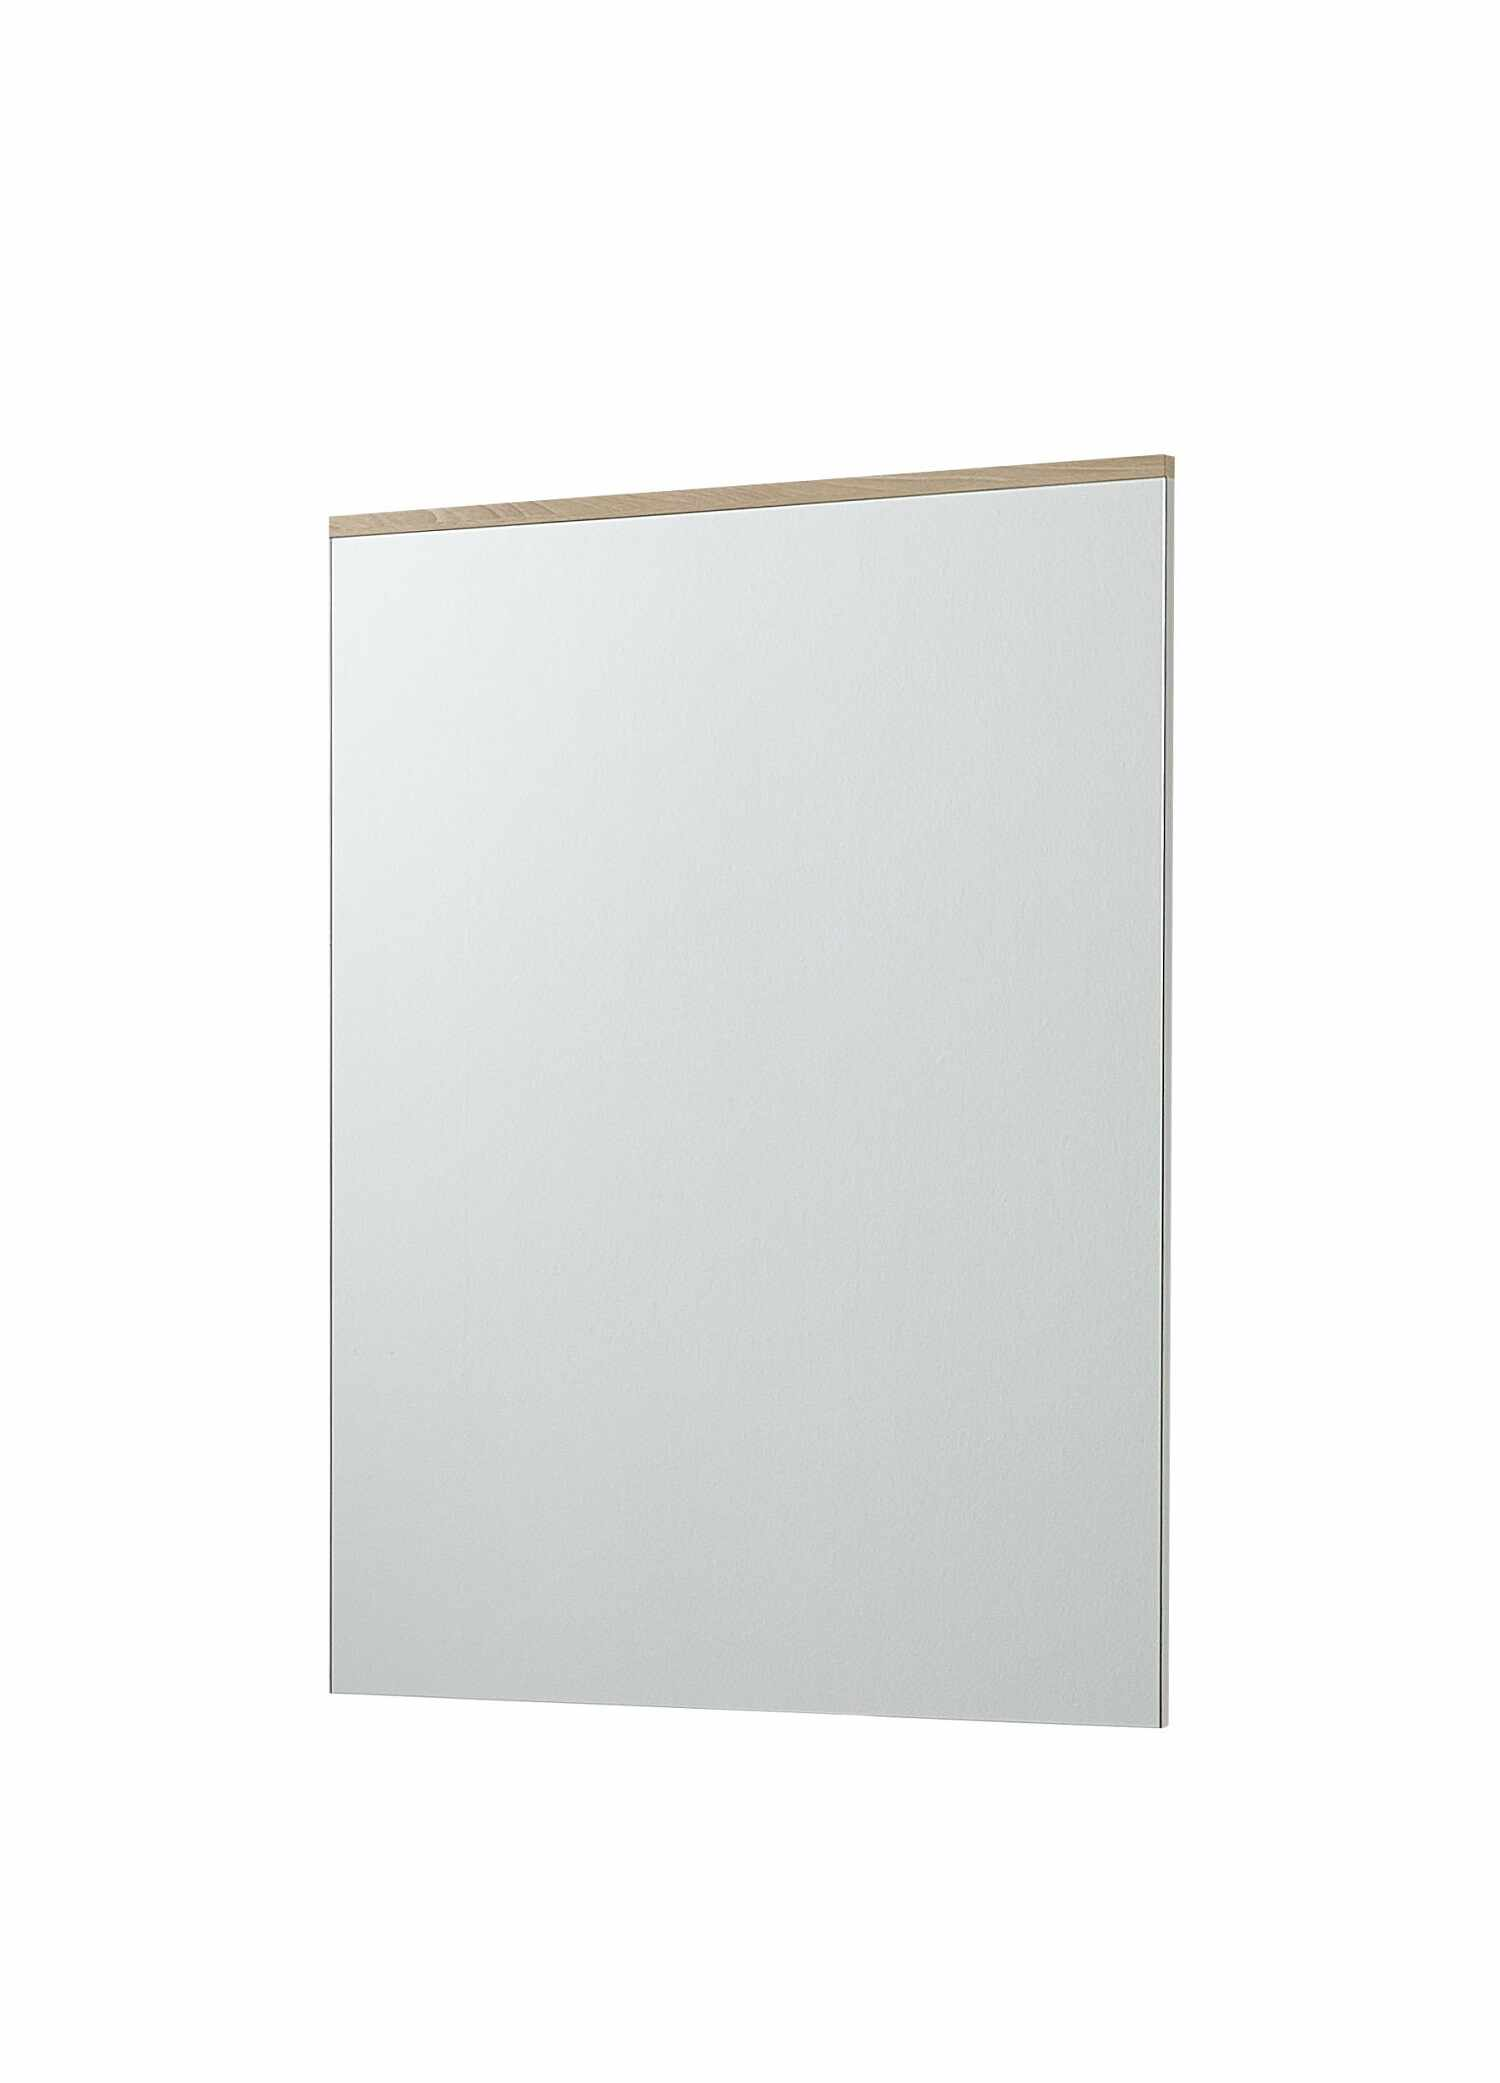 Oglinda decorativa din MDF, Renos Alb / Fag, l65xH88 cm la pret 418 lei